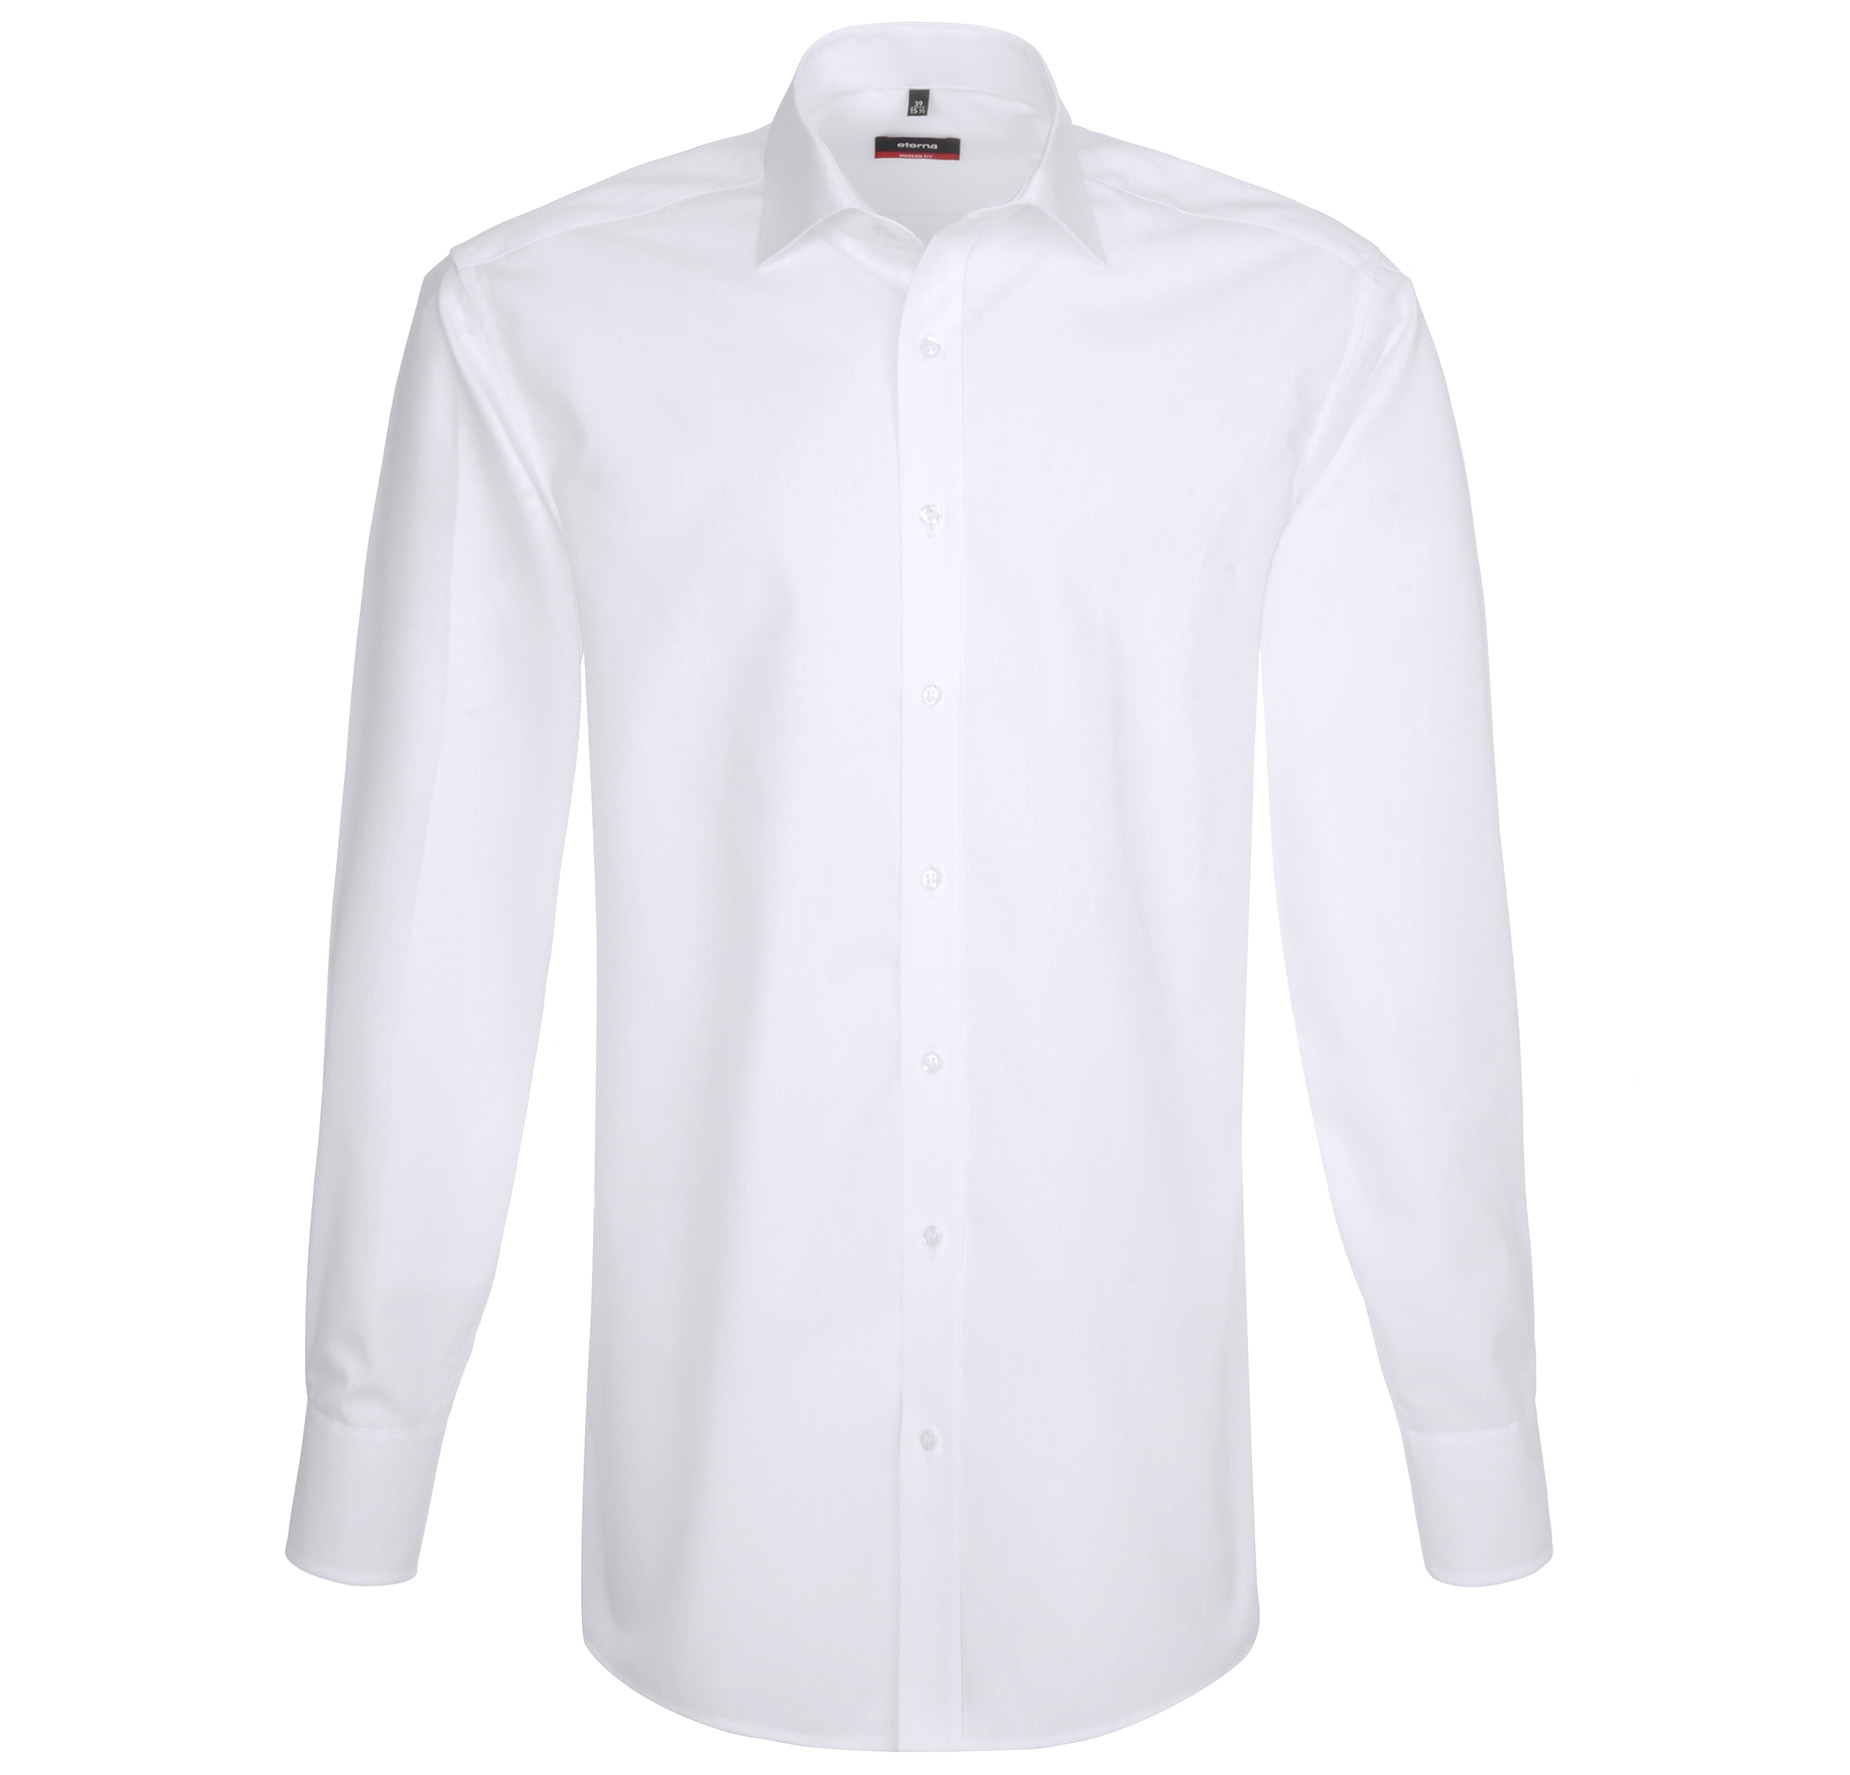 ETERNA Herren Langarm Hemd Modern Fit Uni Popeline weiß 1360.00.X187